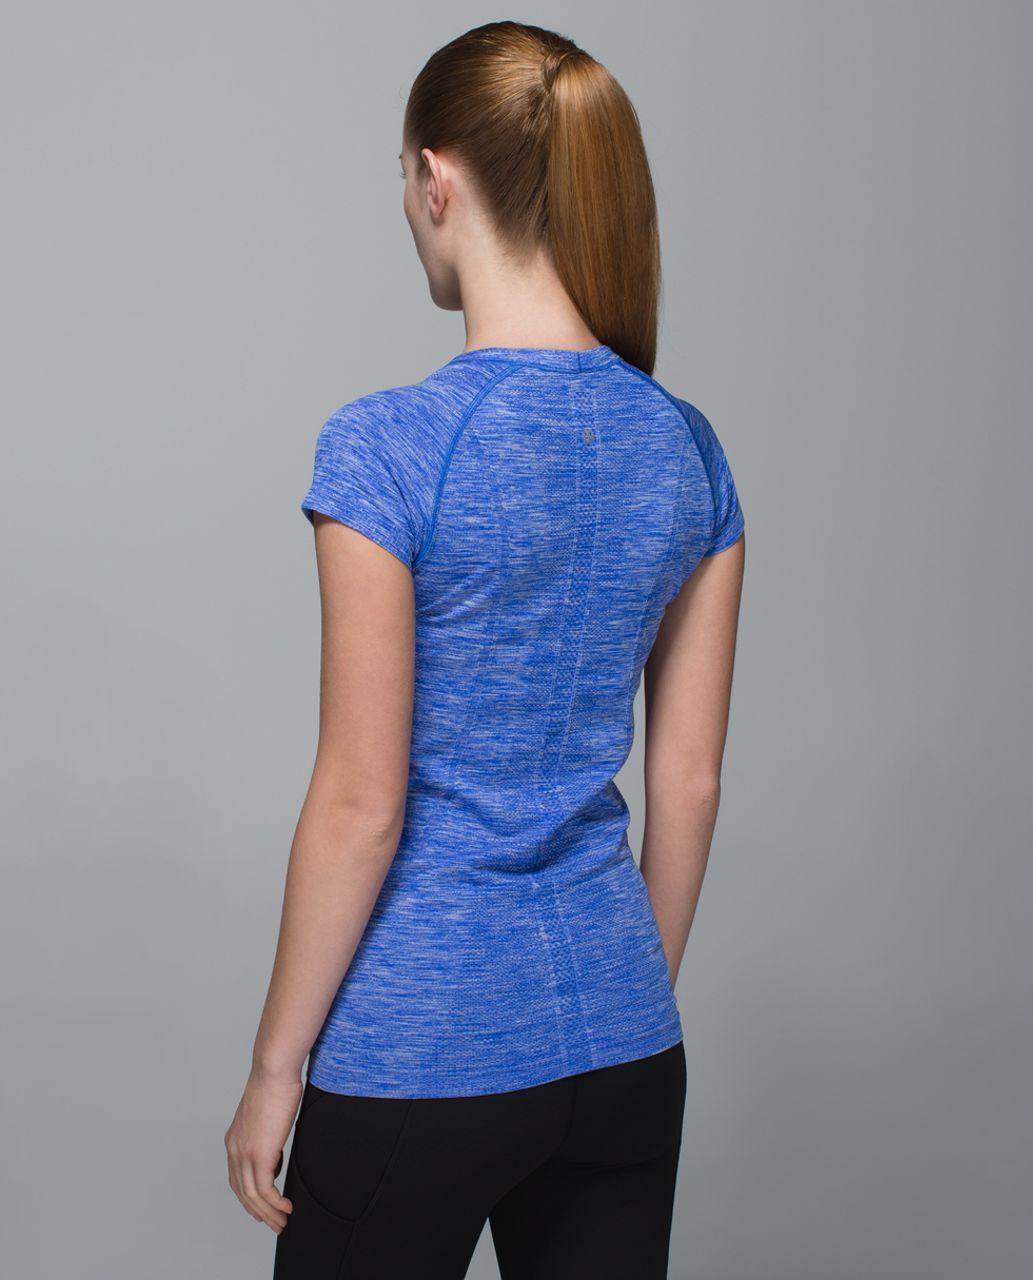 Lululemon Run:  Swiftly Tech Short Sleeve Crew - Space Dye Heathered Harbour Blue